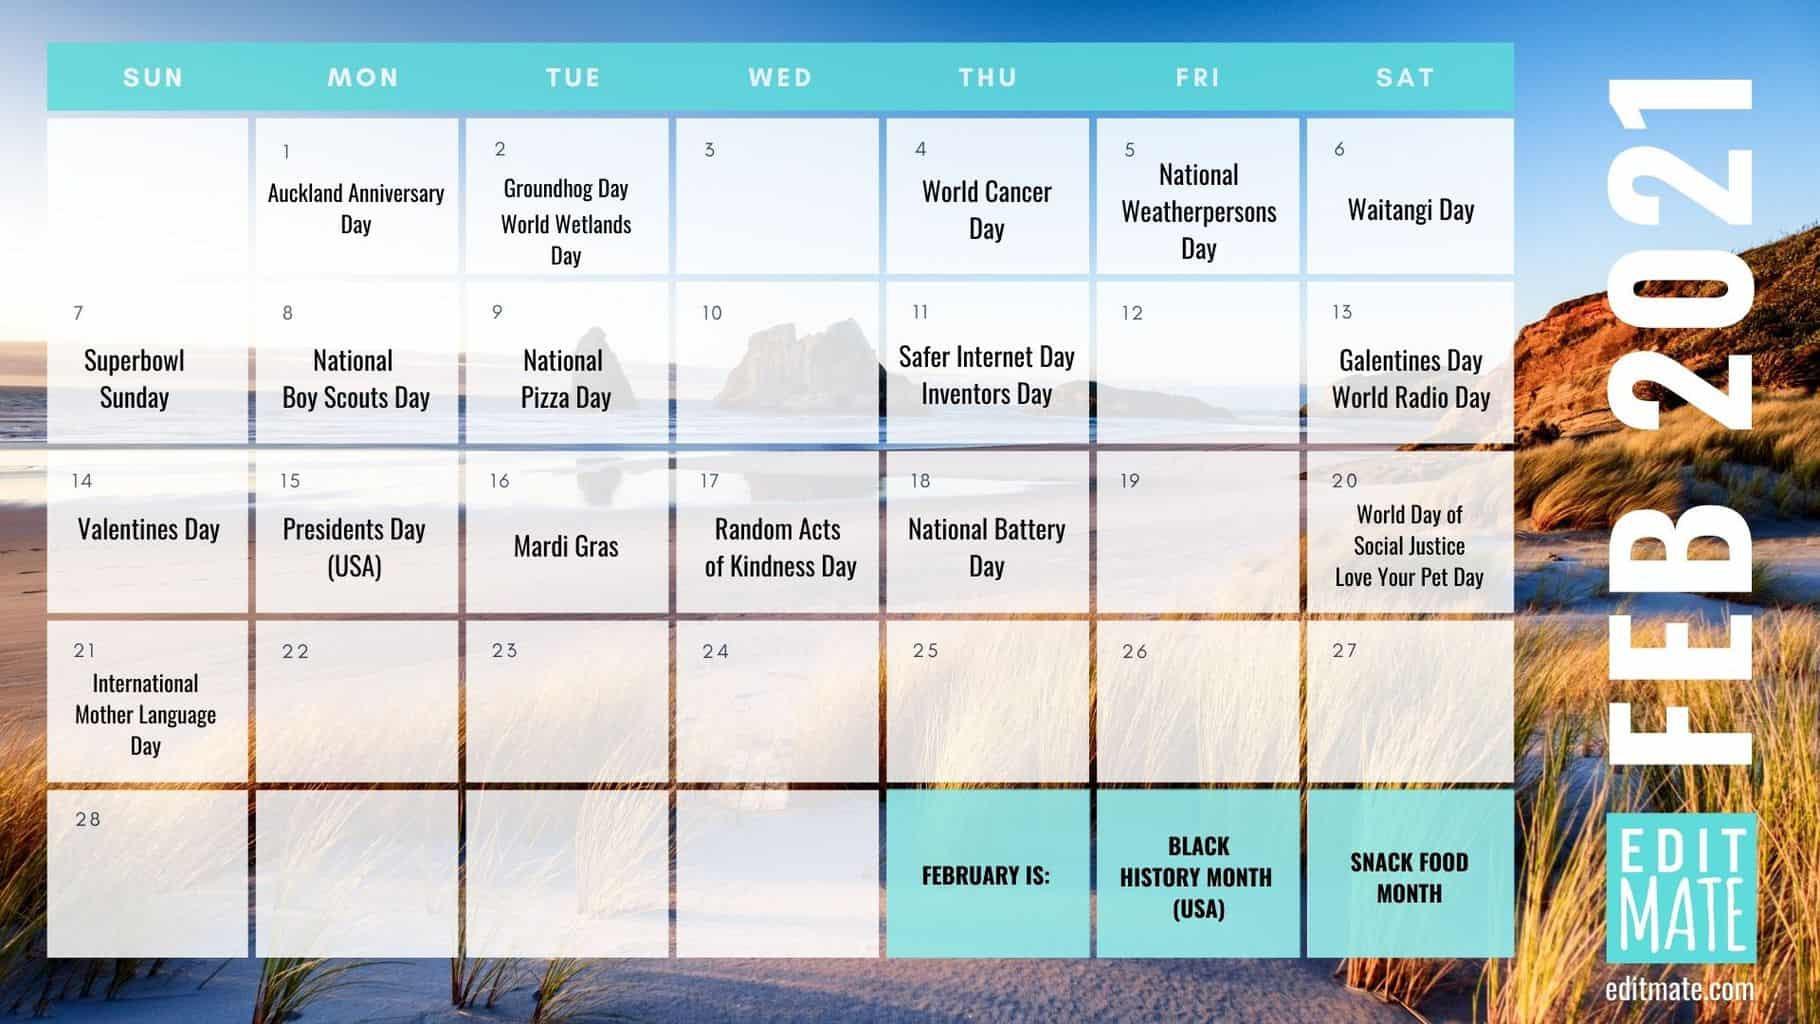 2021 Social Media Holiday Calendar   Editmate-National Food Days 2021